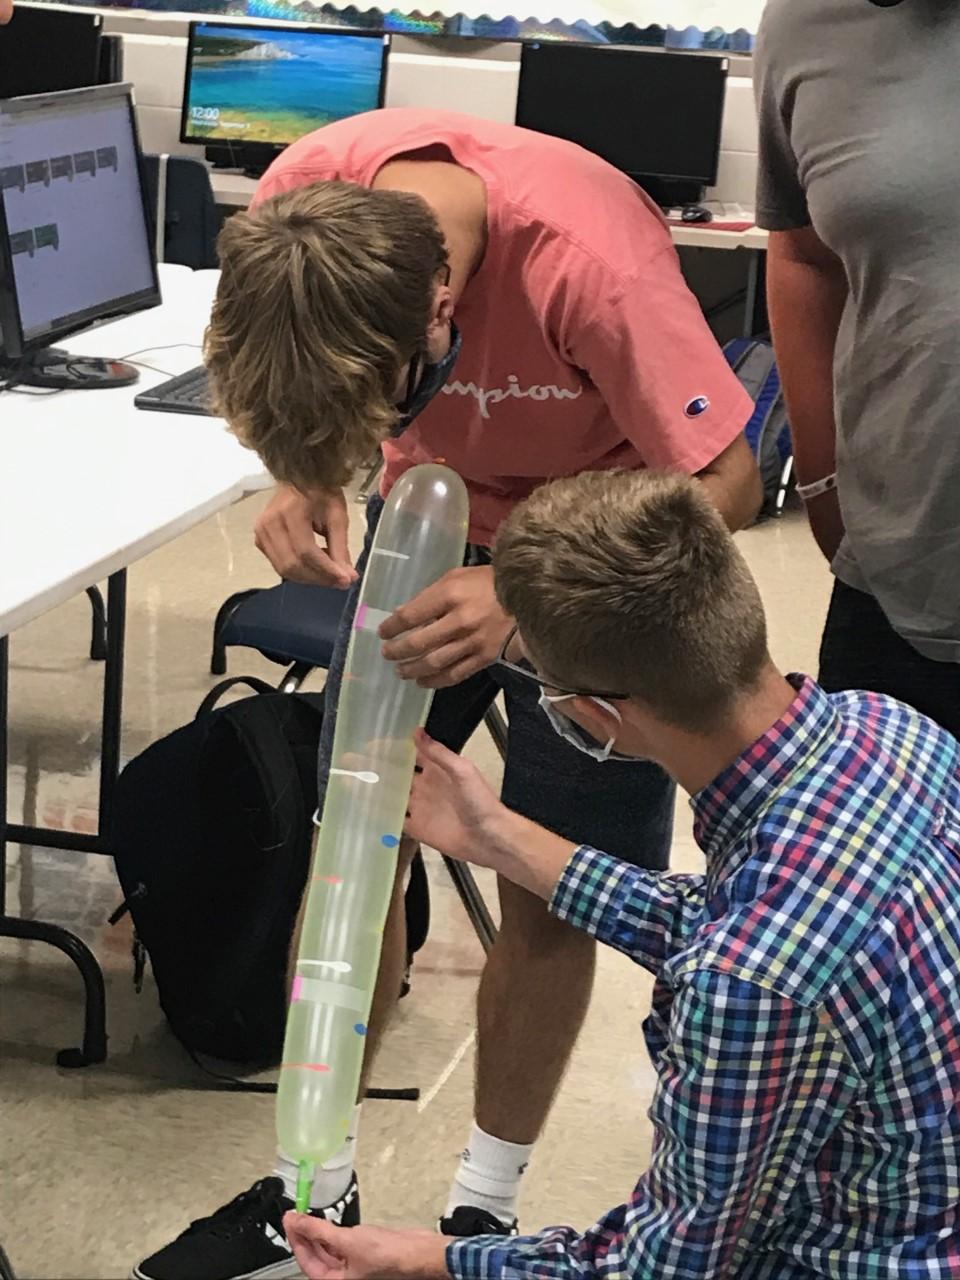 Students prepare a rocket in Zane Trace's Aviation class.